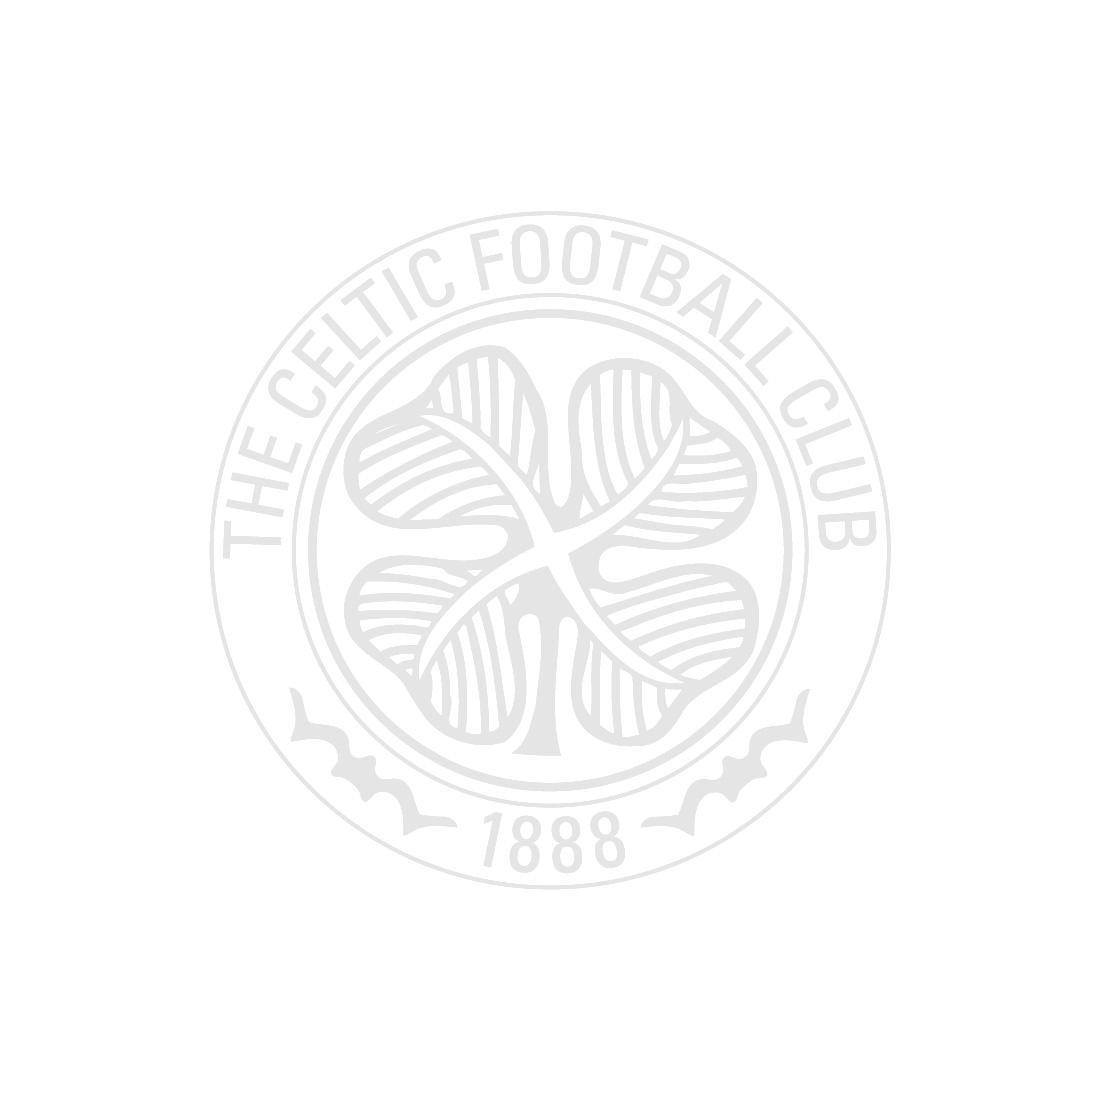 Celtic FC McGregor Autograph Mug